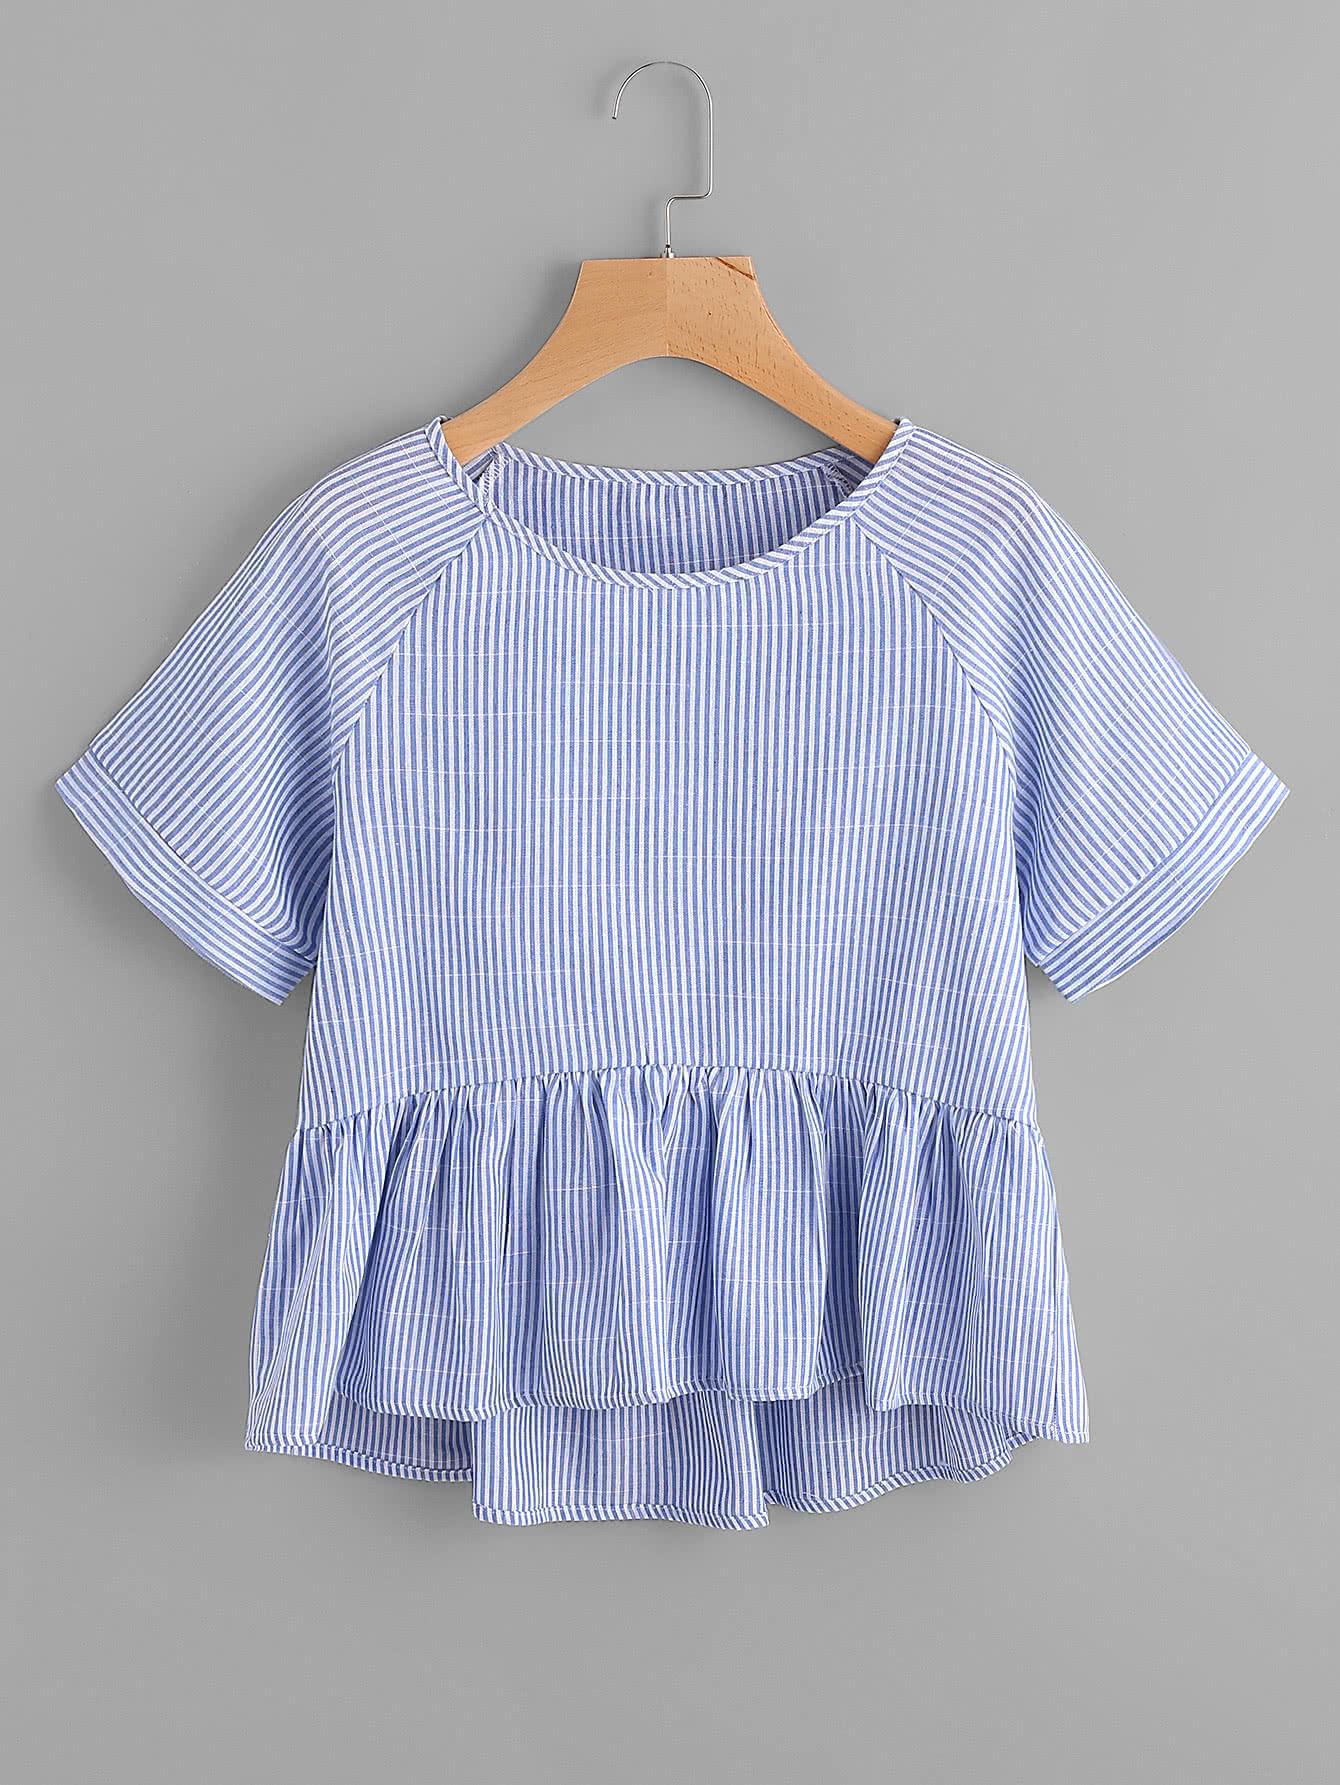 Vertical Striped Raglan Sleeve Smock Blouse blouse170529131